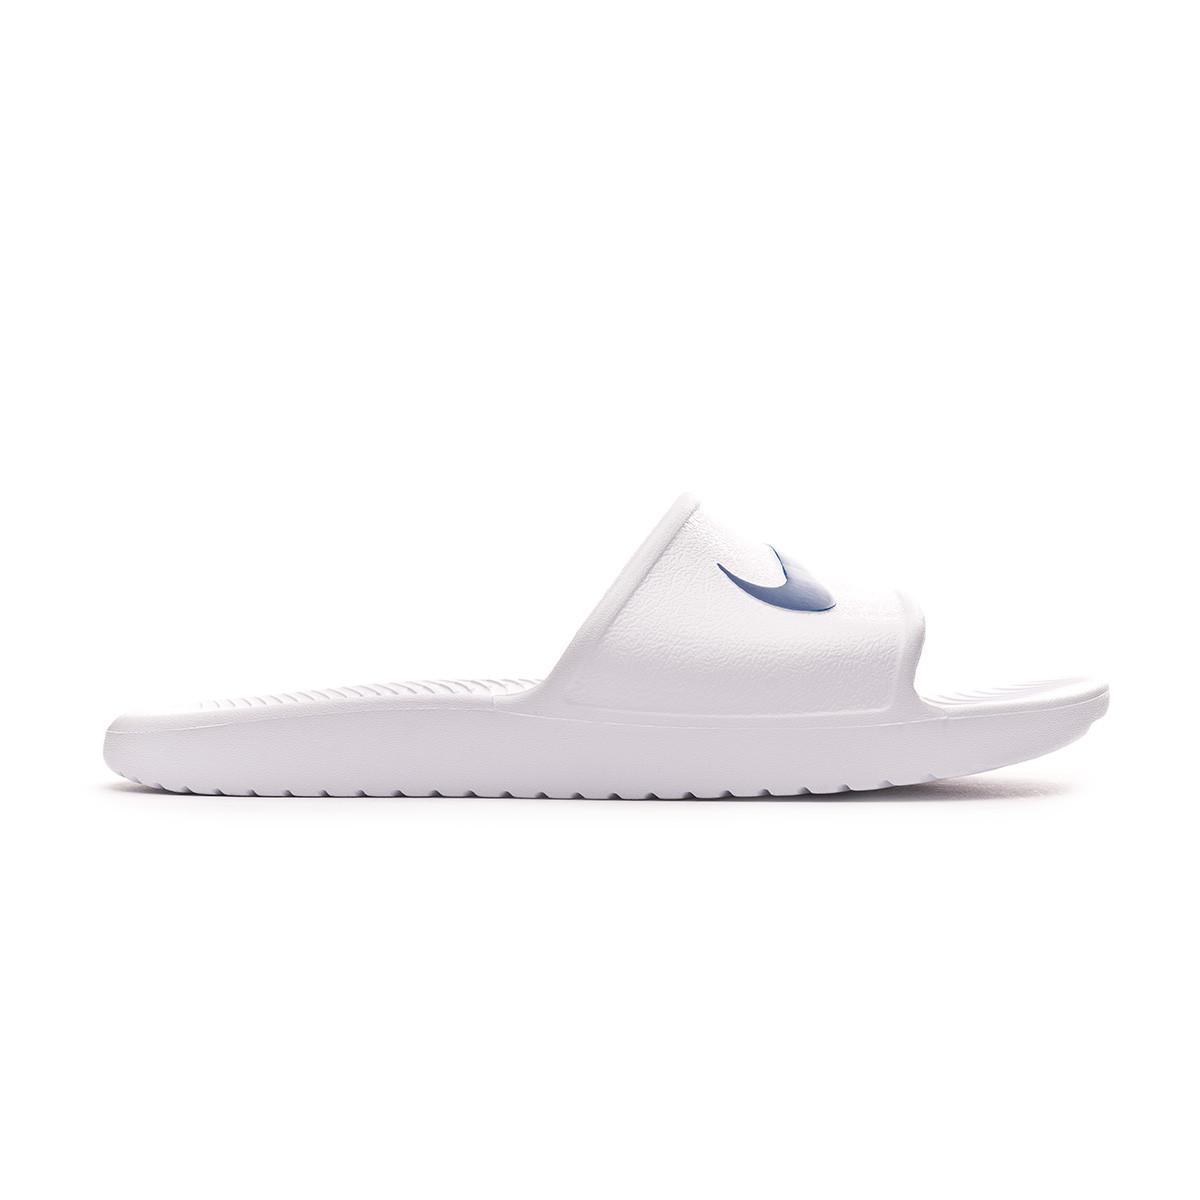 1e7526589 Flip-flops Nike Kawa Shower White-Blue moon - Football store Fútbol Emotion